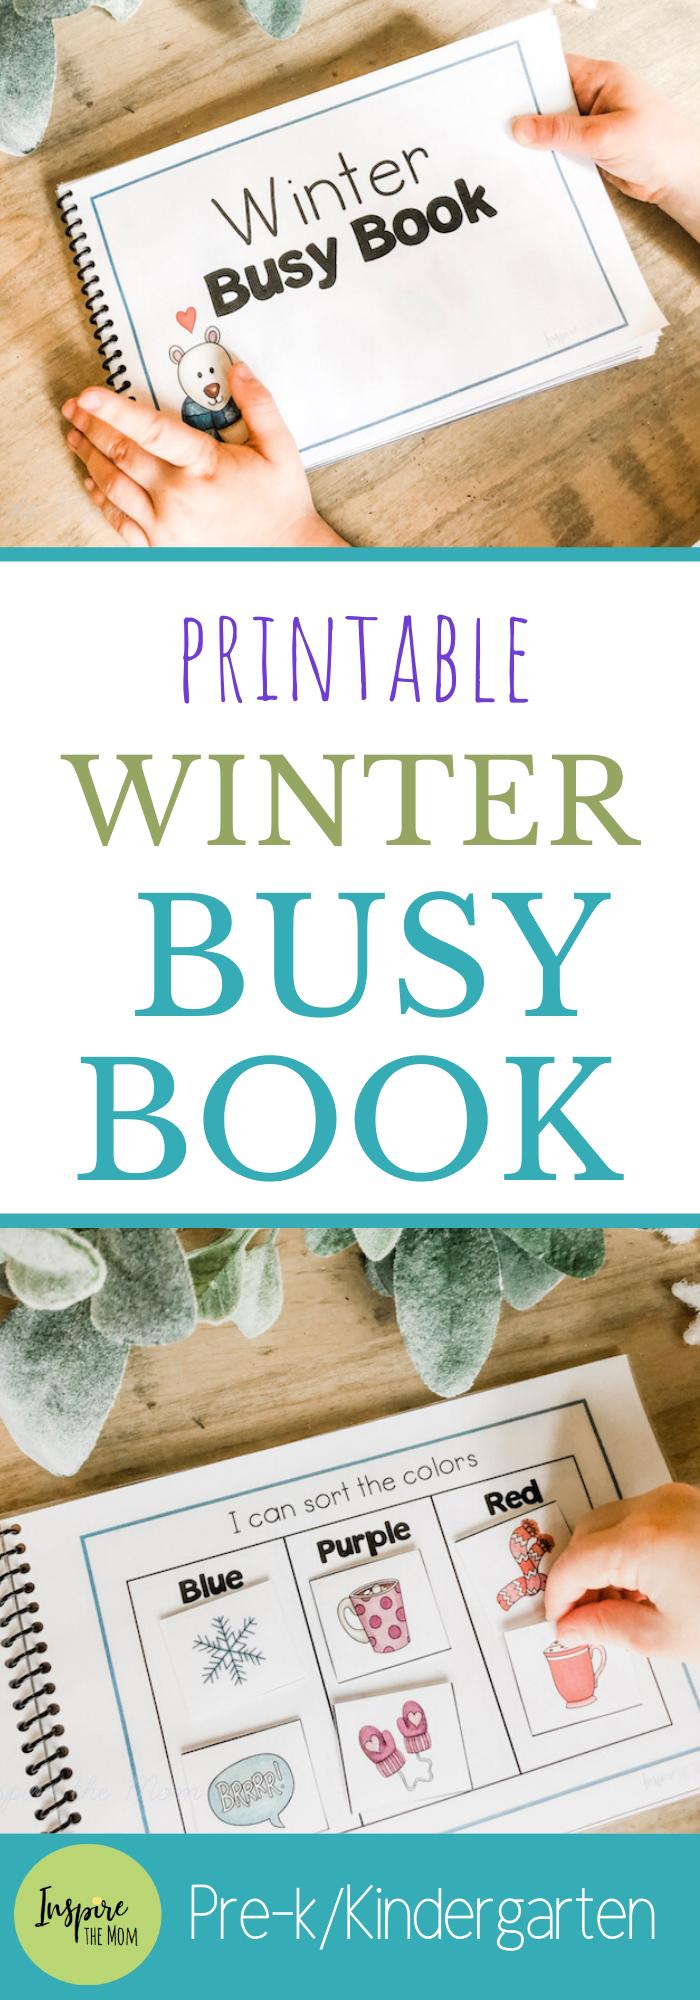 Printable Winter Busy Book  Inspire the Mom Fun Printable Winter Busy Book for preschool or kindergarten